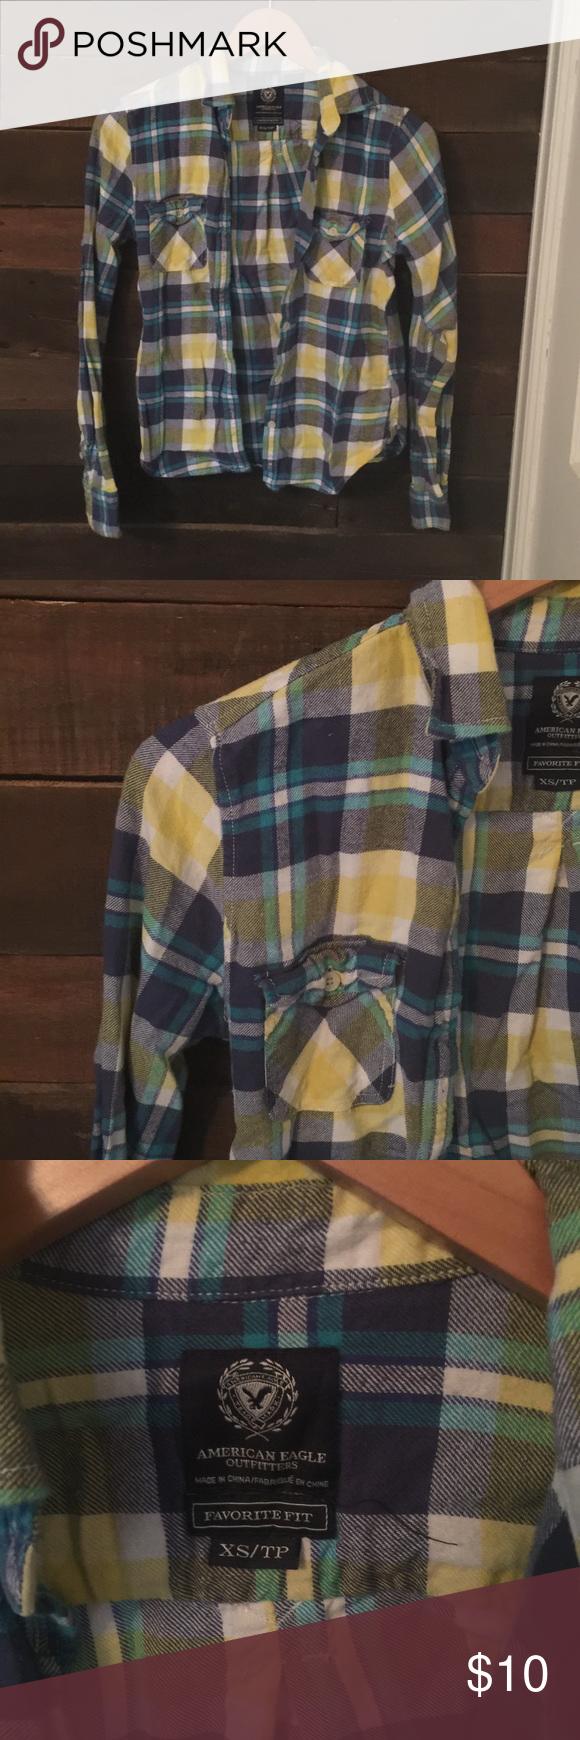 Flannel shirts yellow  Plaid flannel shirt  Tartan Flannel shirts and White plaid